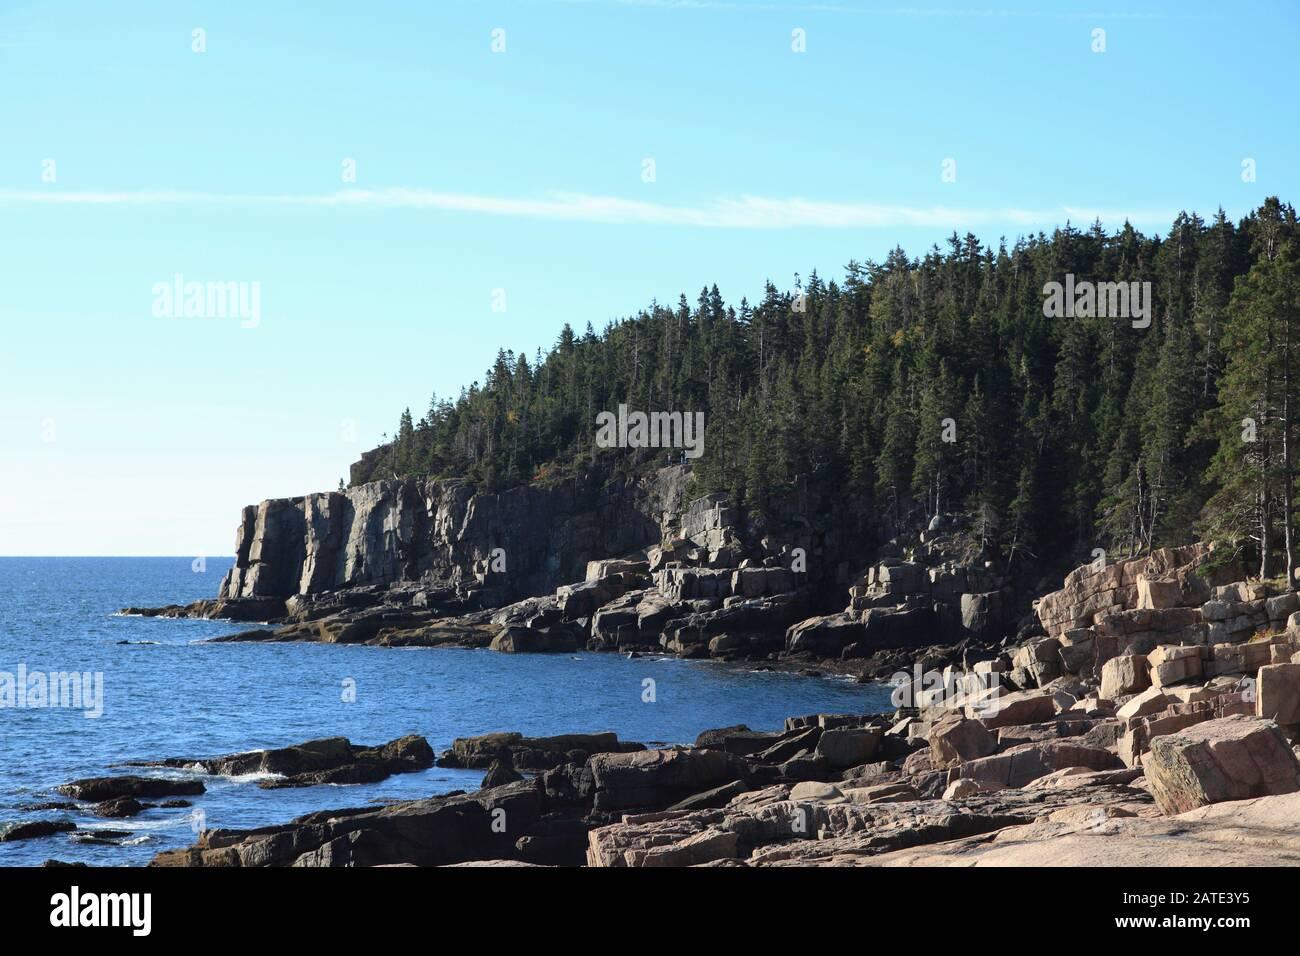 Otter Cliff, Atlantic Coastline, Acadia National Park, Mount Desert Island, Maine, New England, USA Stock Photo